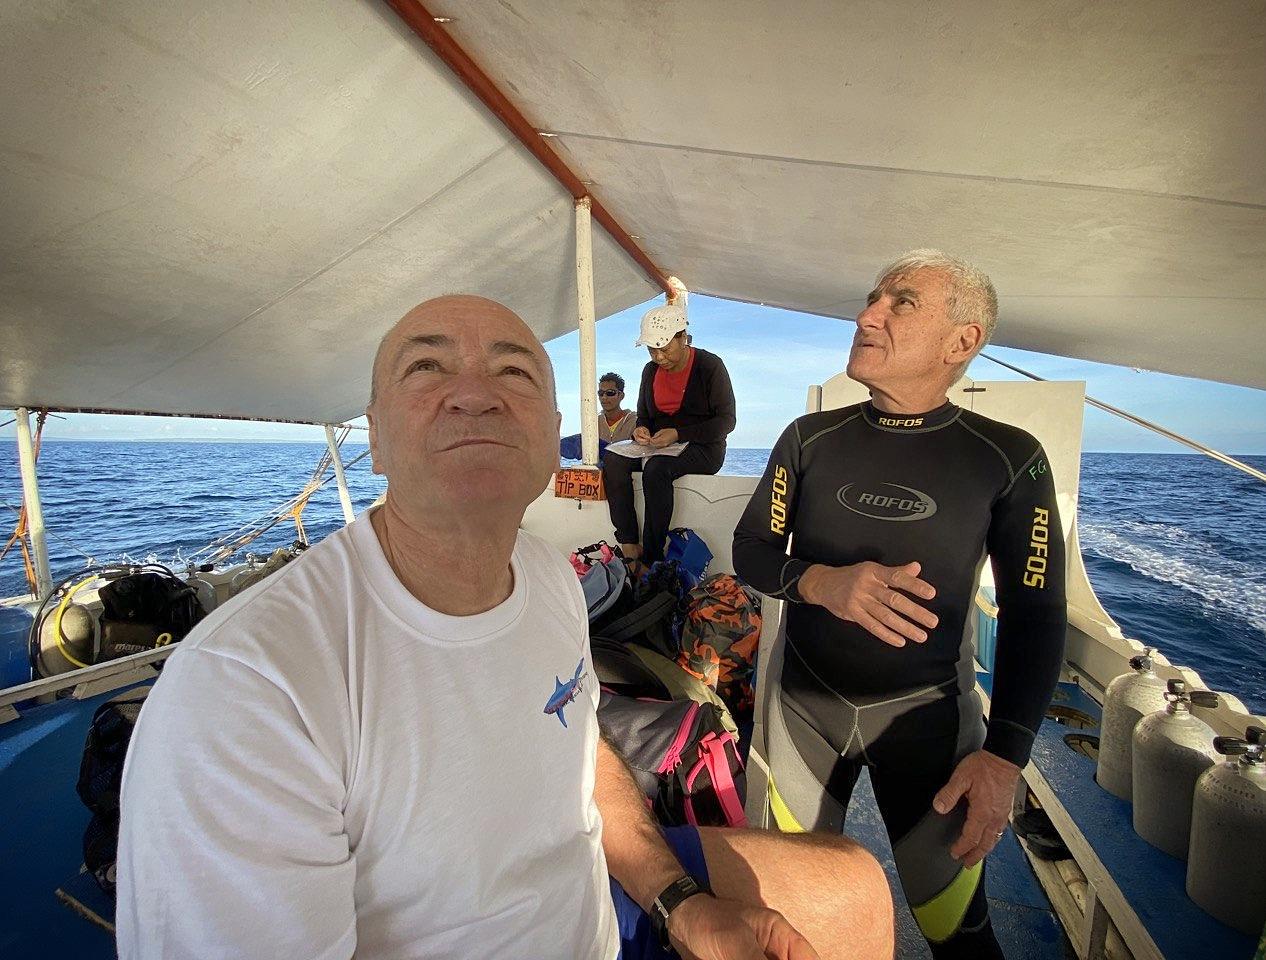 Isola di Malapasqua, Olgiata Diving Febbraio 2020, People 16